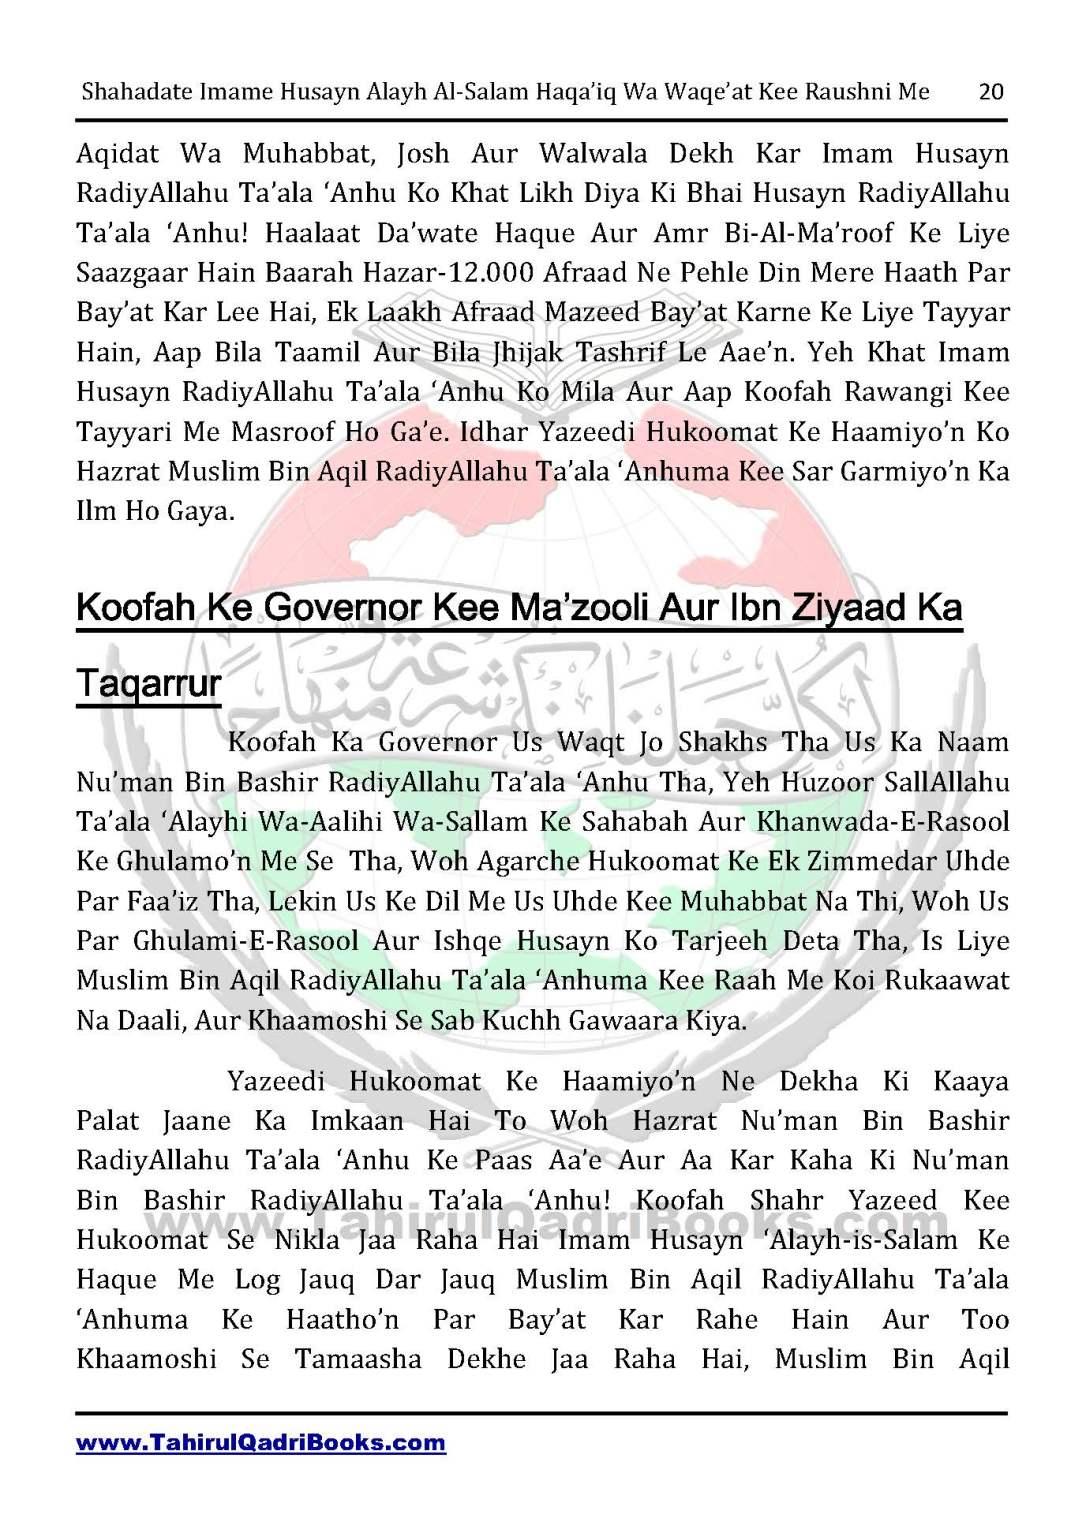 shahadate-imame-husayn-alayh-is-salam-haqaiq-wa-waqe_at-kee-raushni-me-in-roman-urdu-unlocked_Page_20